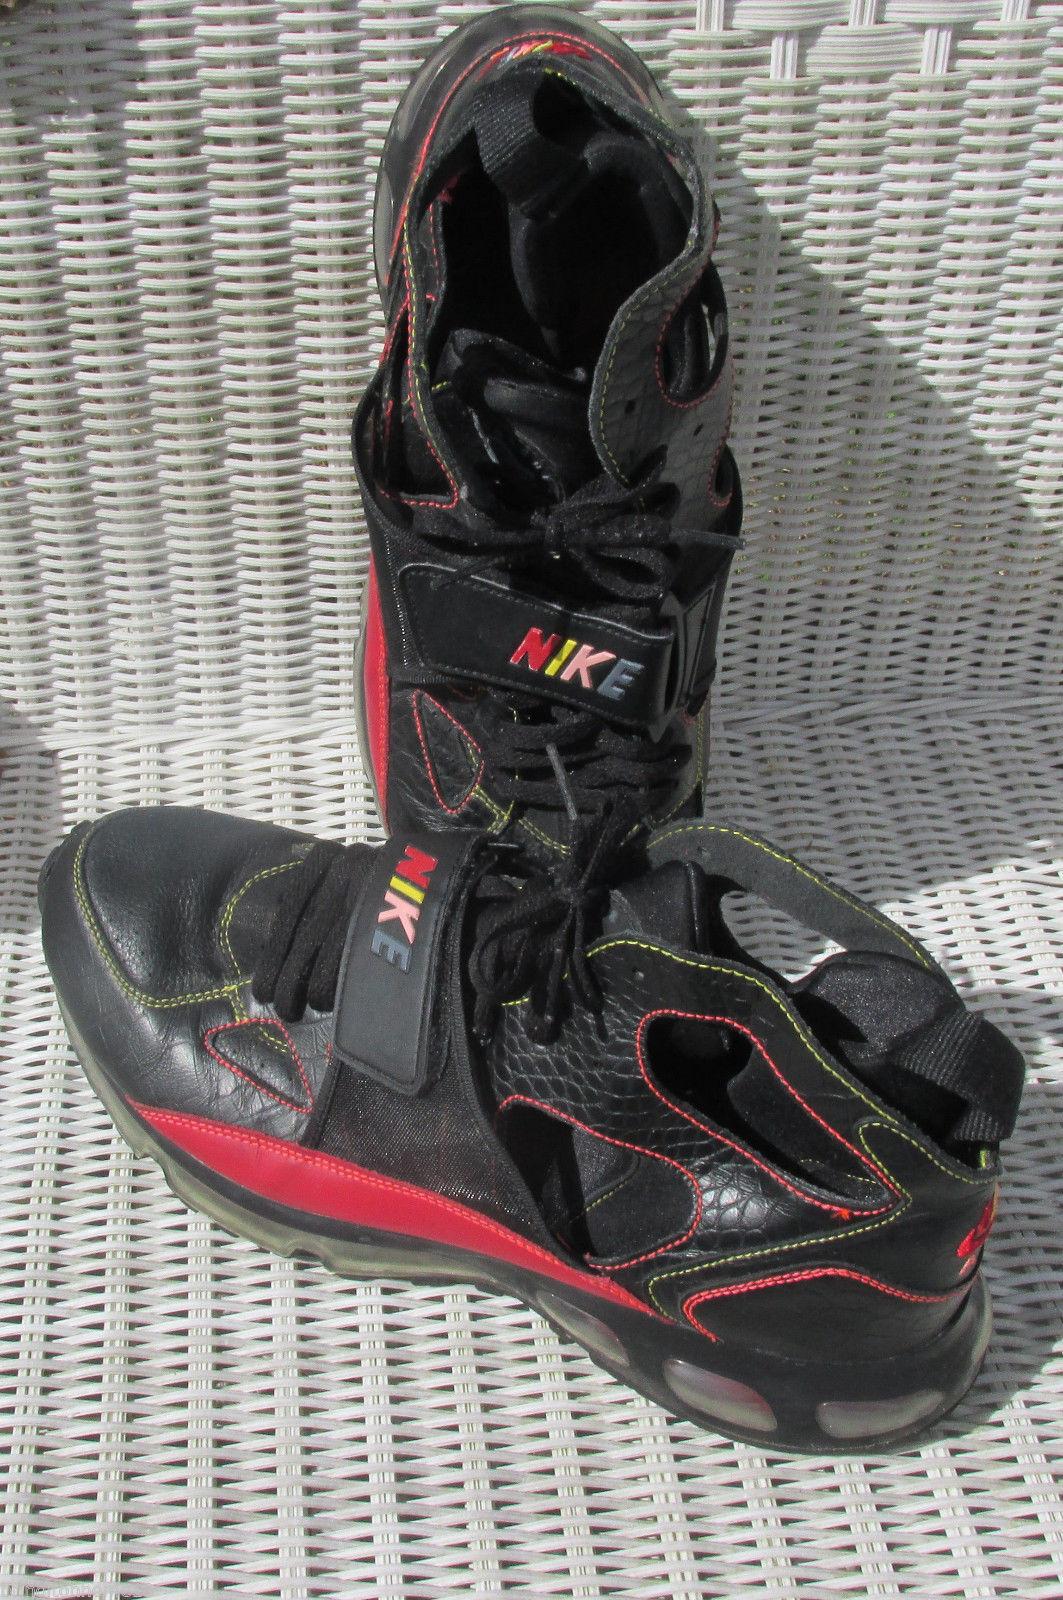 timeless design 7045e 5e14a NIKE Air Trainer Huarache 360 Shoes Men s and 50 similar items. S l1600